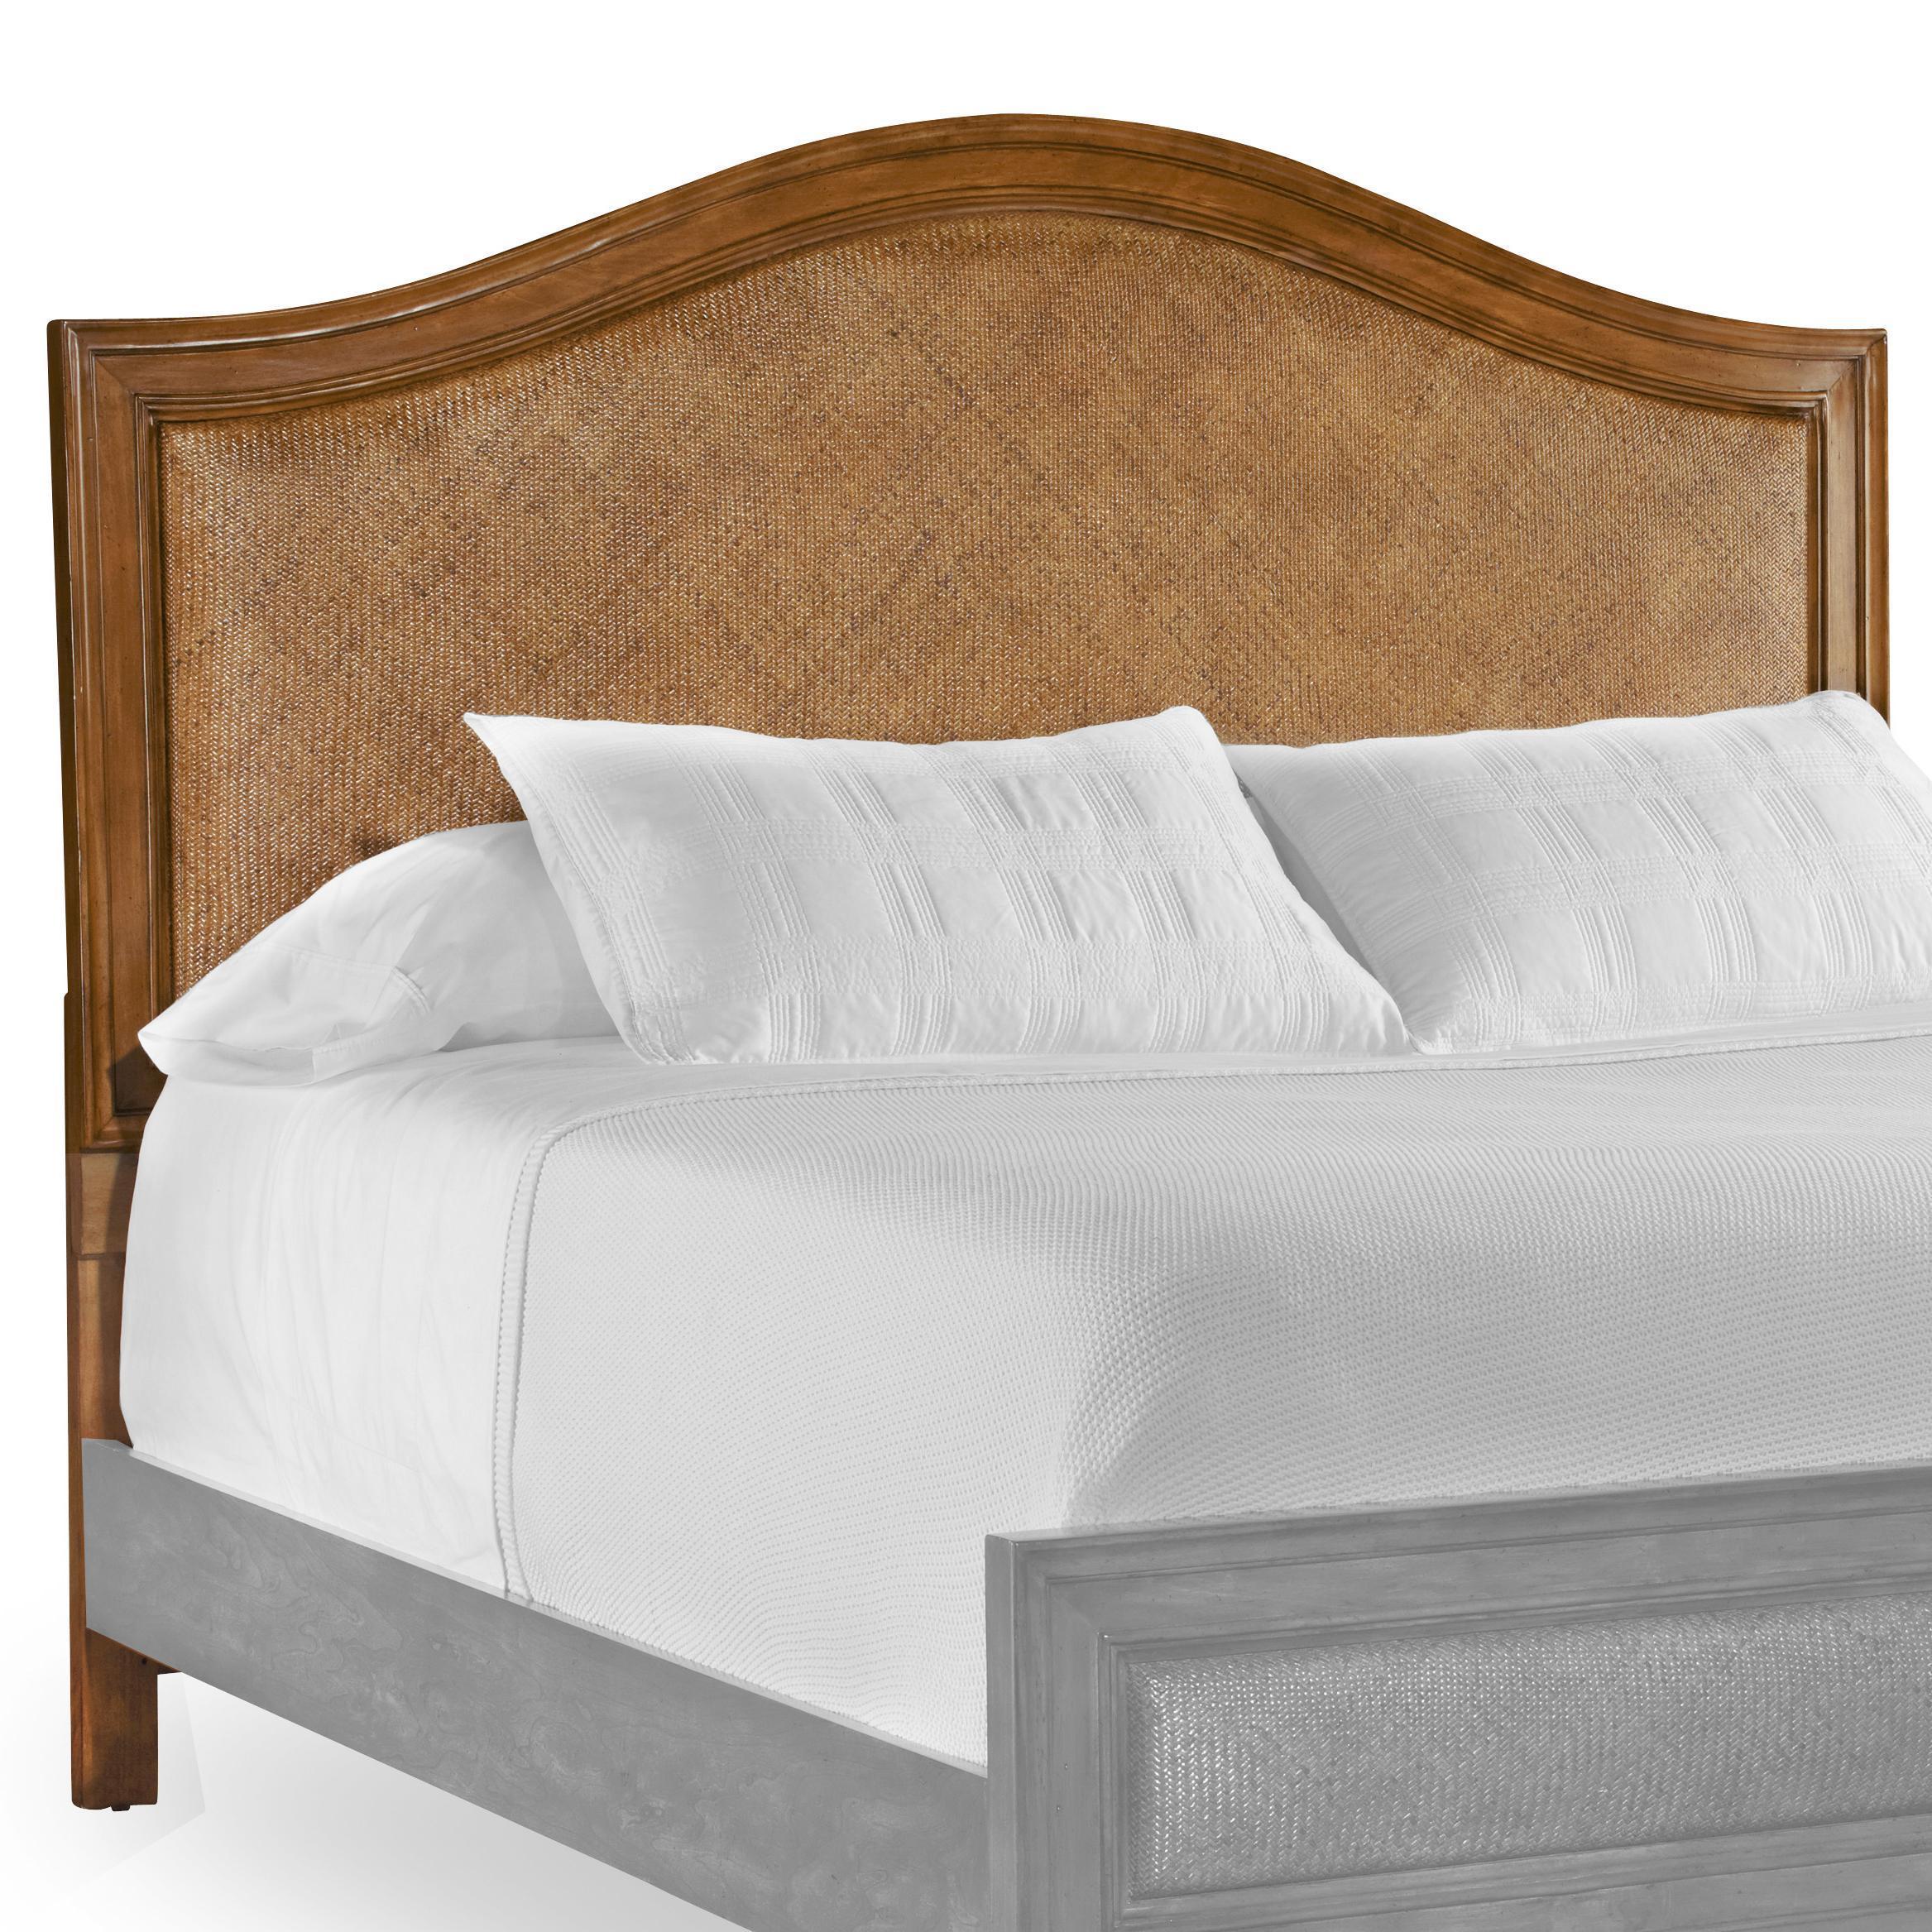 Hooker Furniture Windward Queen Raffia Headboard - Item Number: 1125-91851